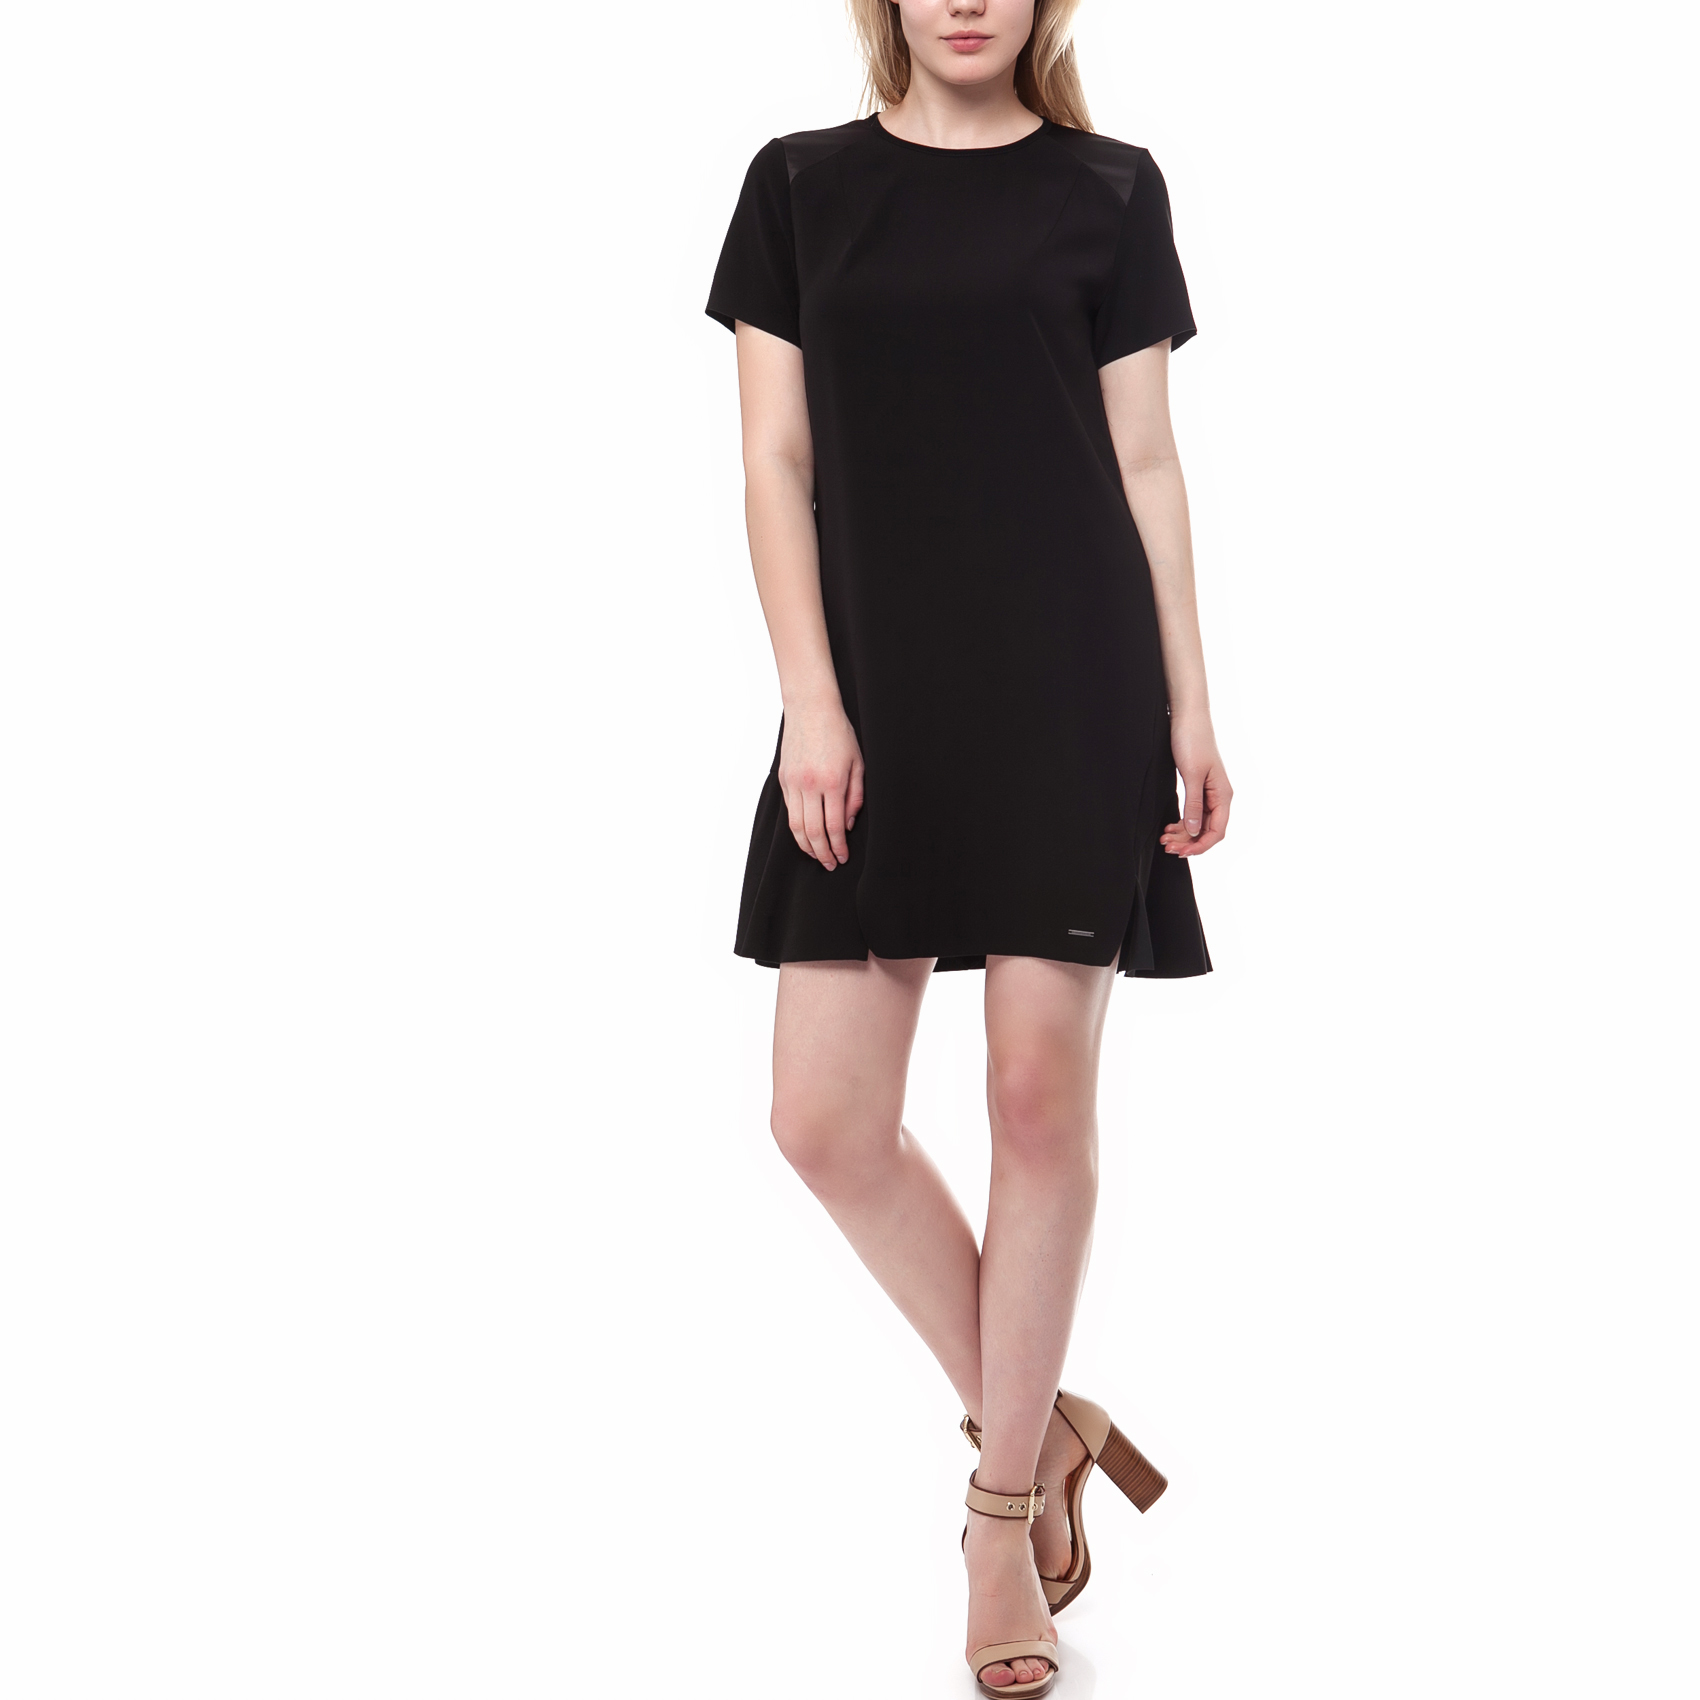 CALVIN KLEIN JEANS - Γυναικείο φόρεμα Calvin Klein Jeans μαύρο 9a95e11109b